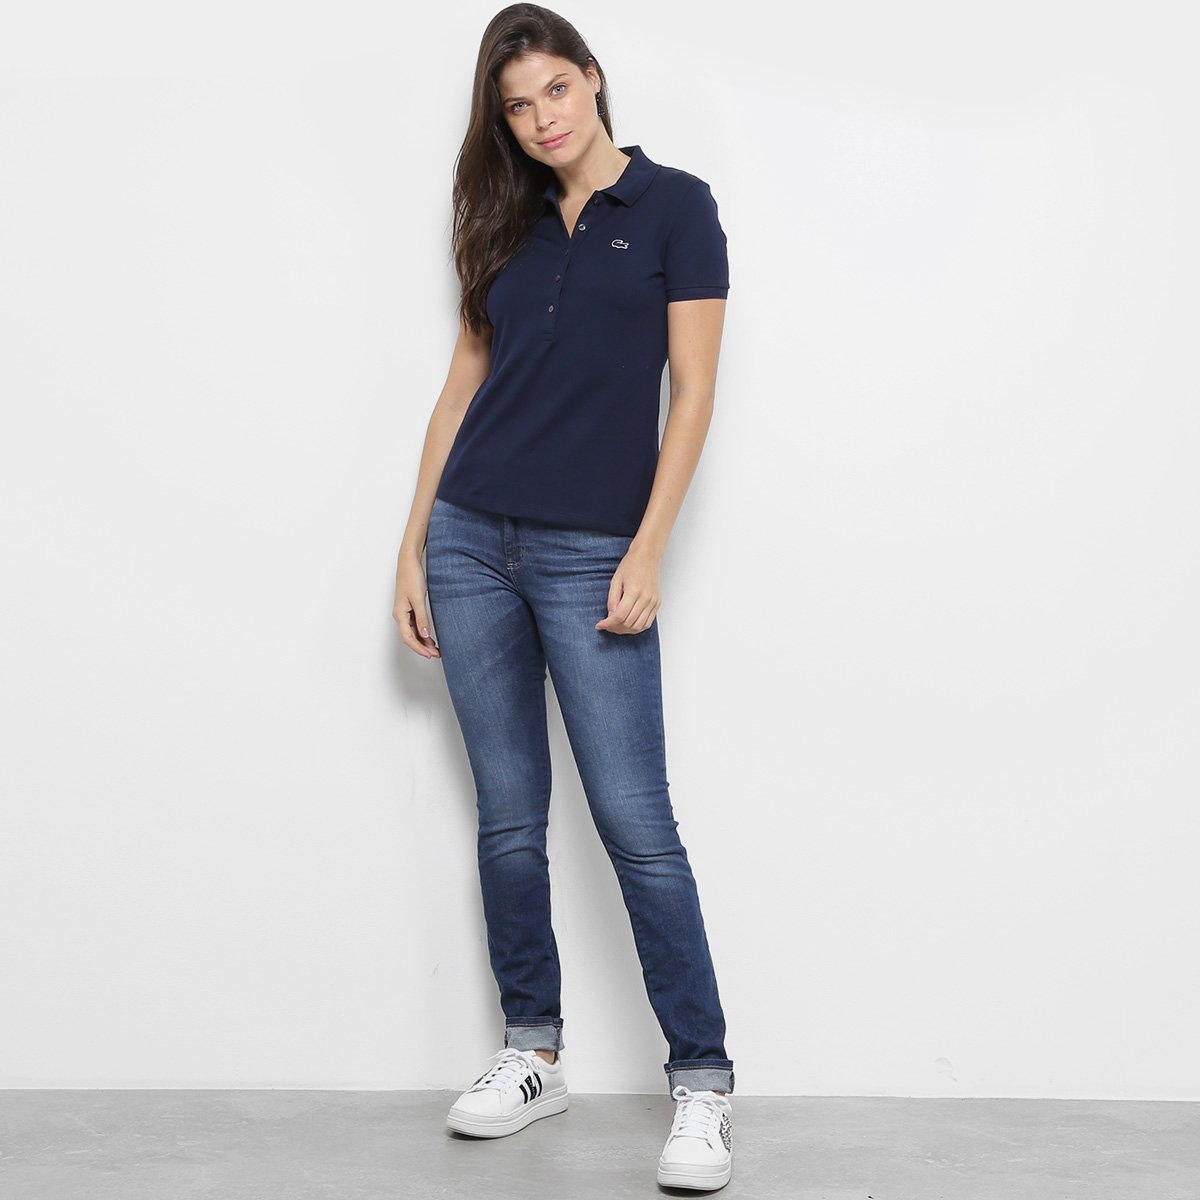 Camisa Polo Lacoste Piquet Manga Curta Feminina - Compre Agora ... f237b438b6796